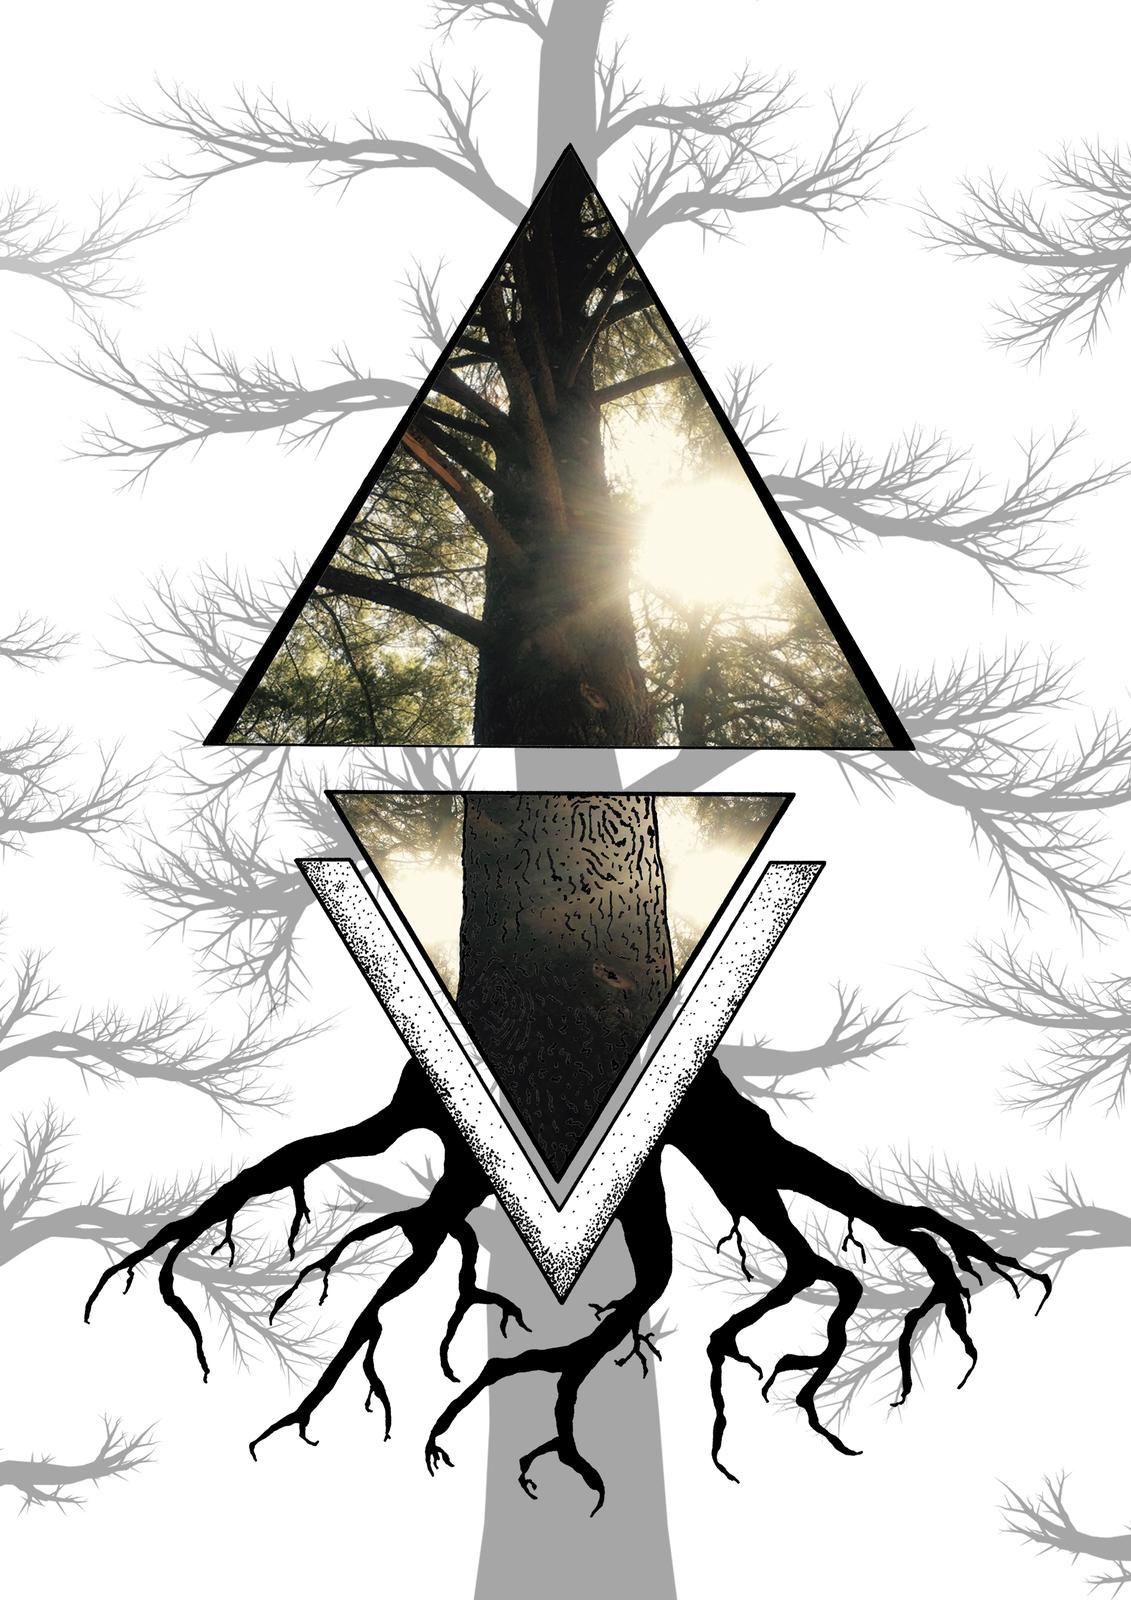 Art Prints - Tree Spirit